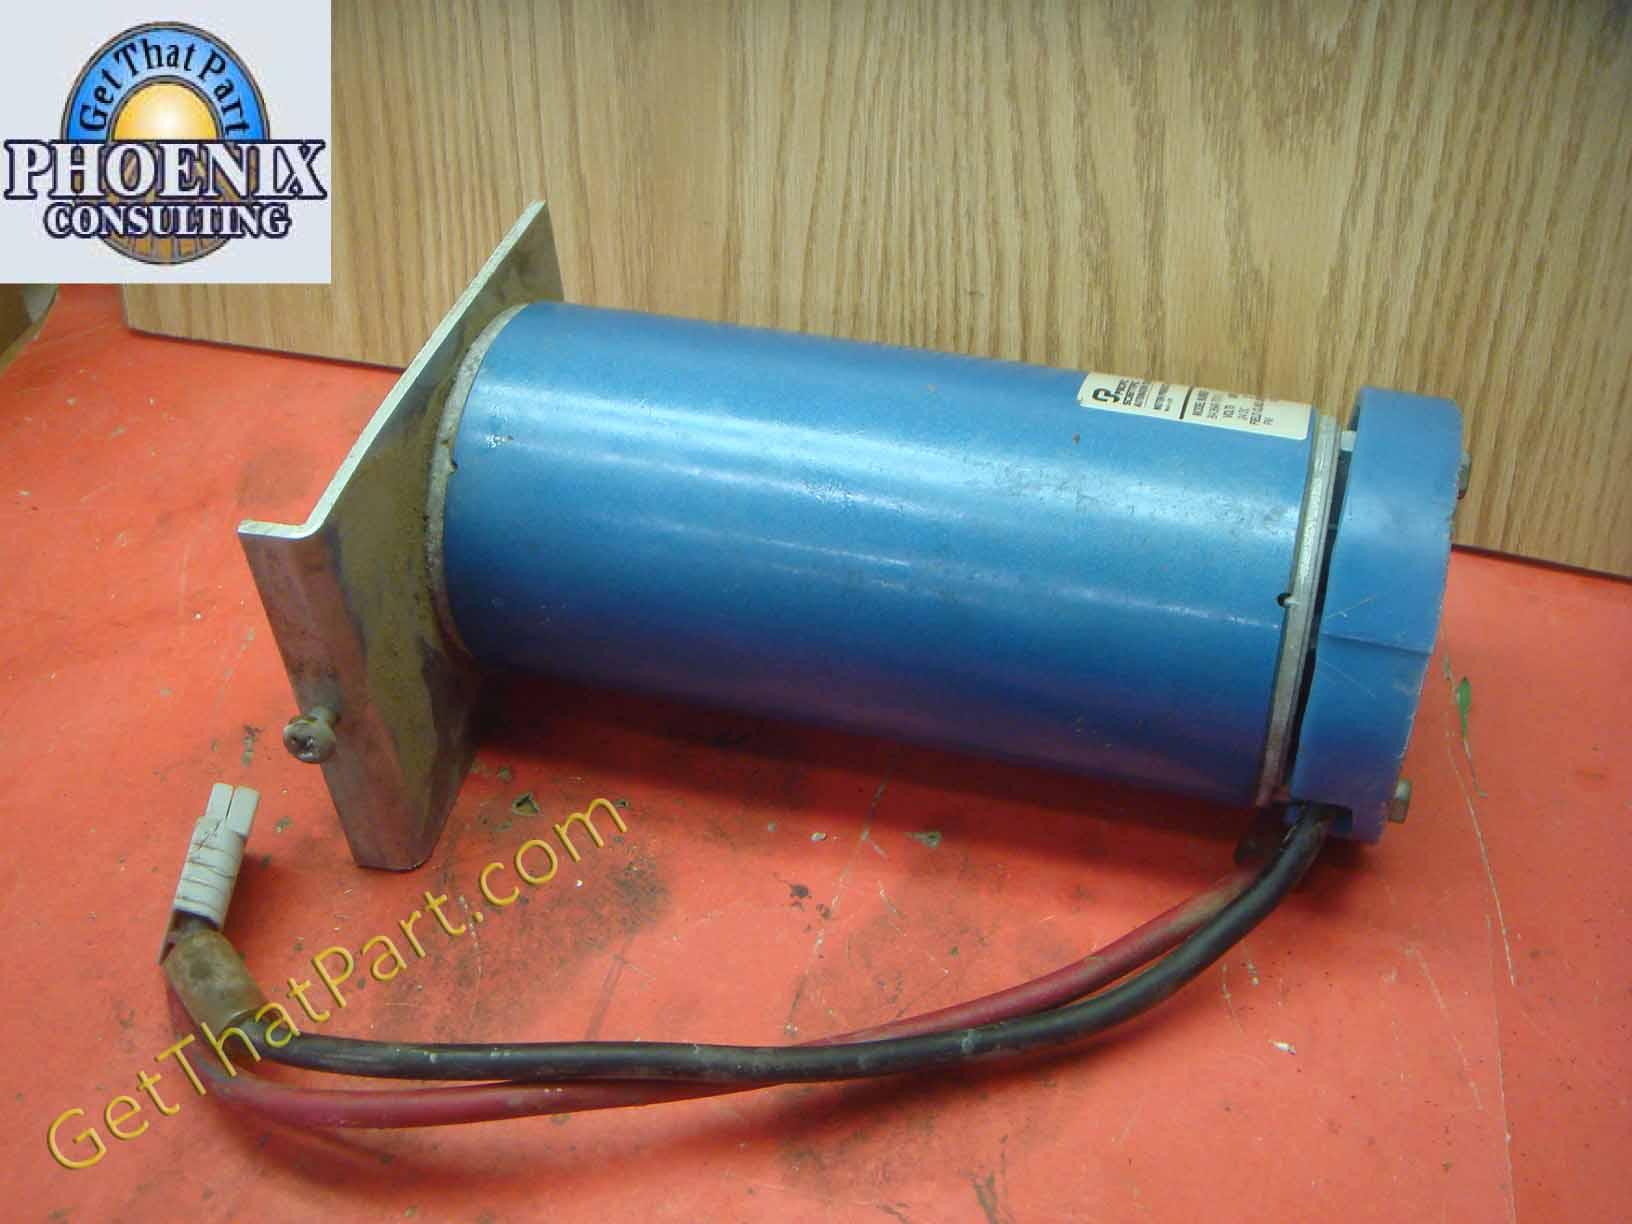 Pacific Scientific Permanent Magnet Dc Motor Ba3640 7013 1